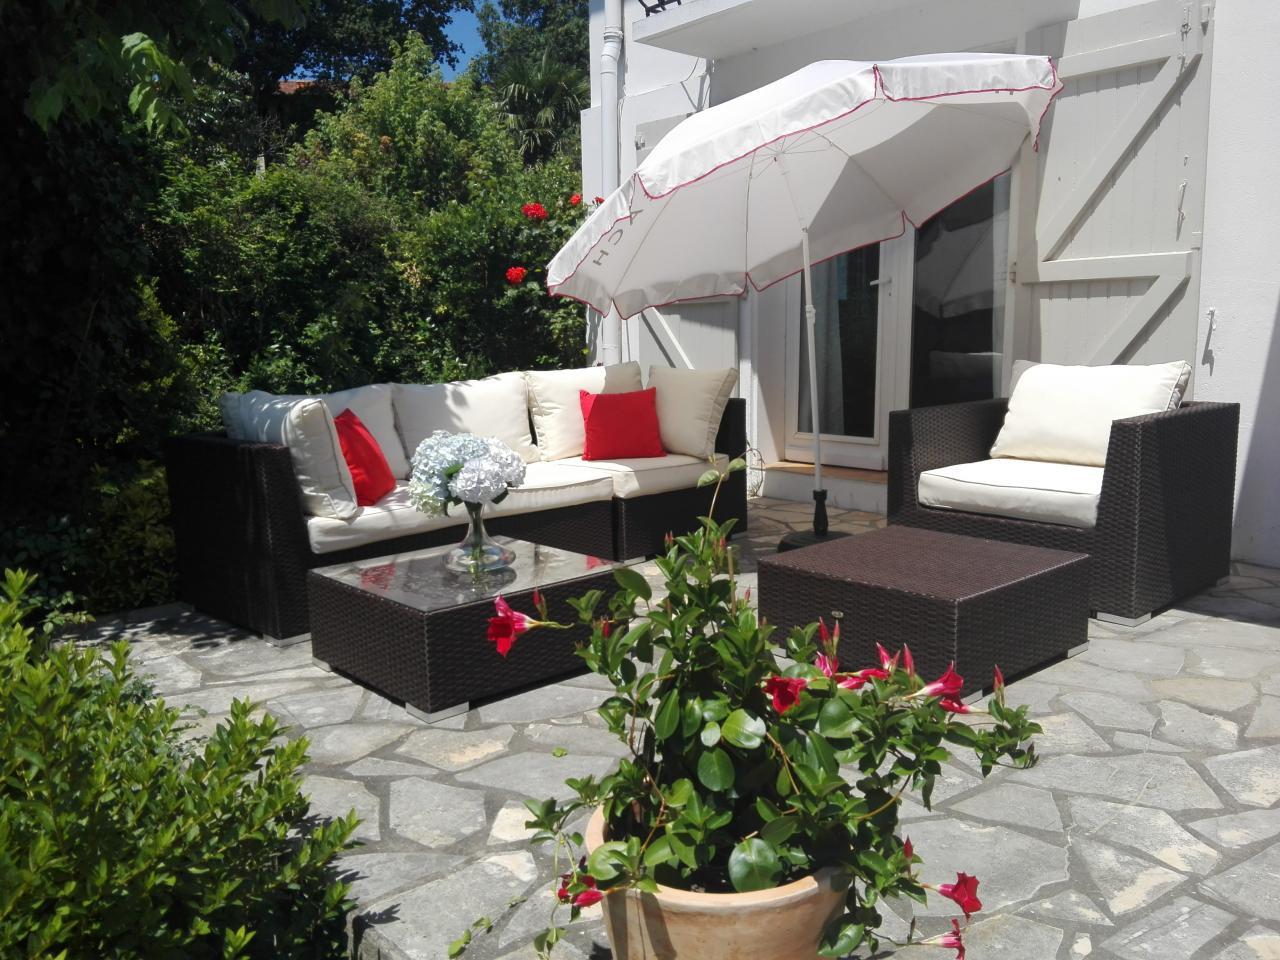 maison c te basque bayonne location pays basque 64. Black Bedroom Furniture Sets. Home Design Ideas